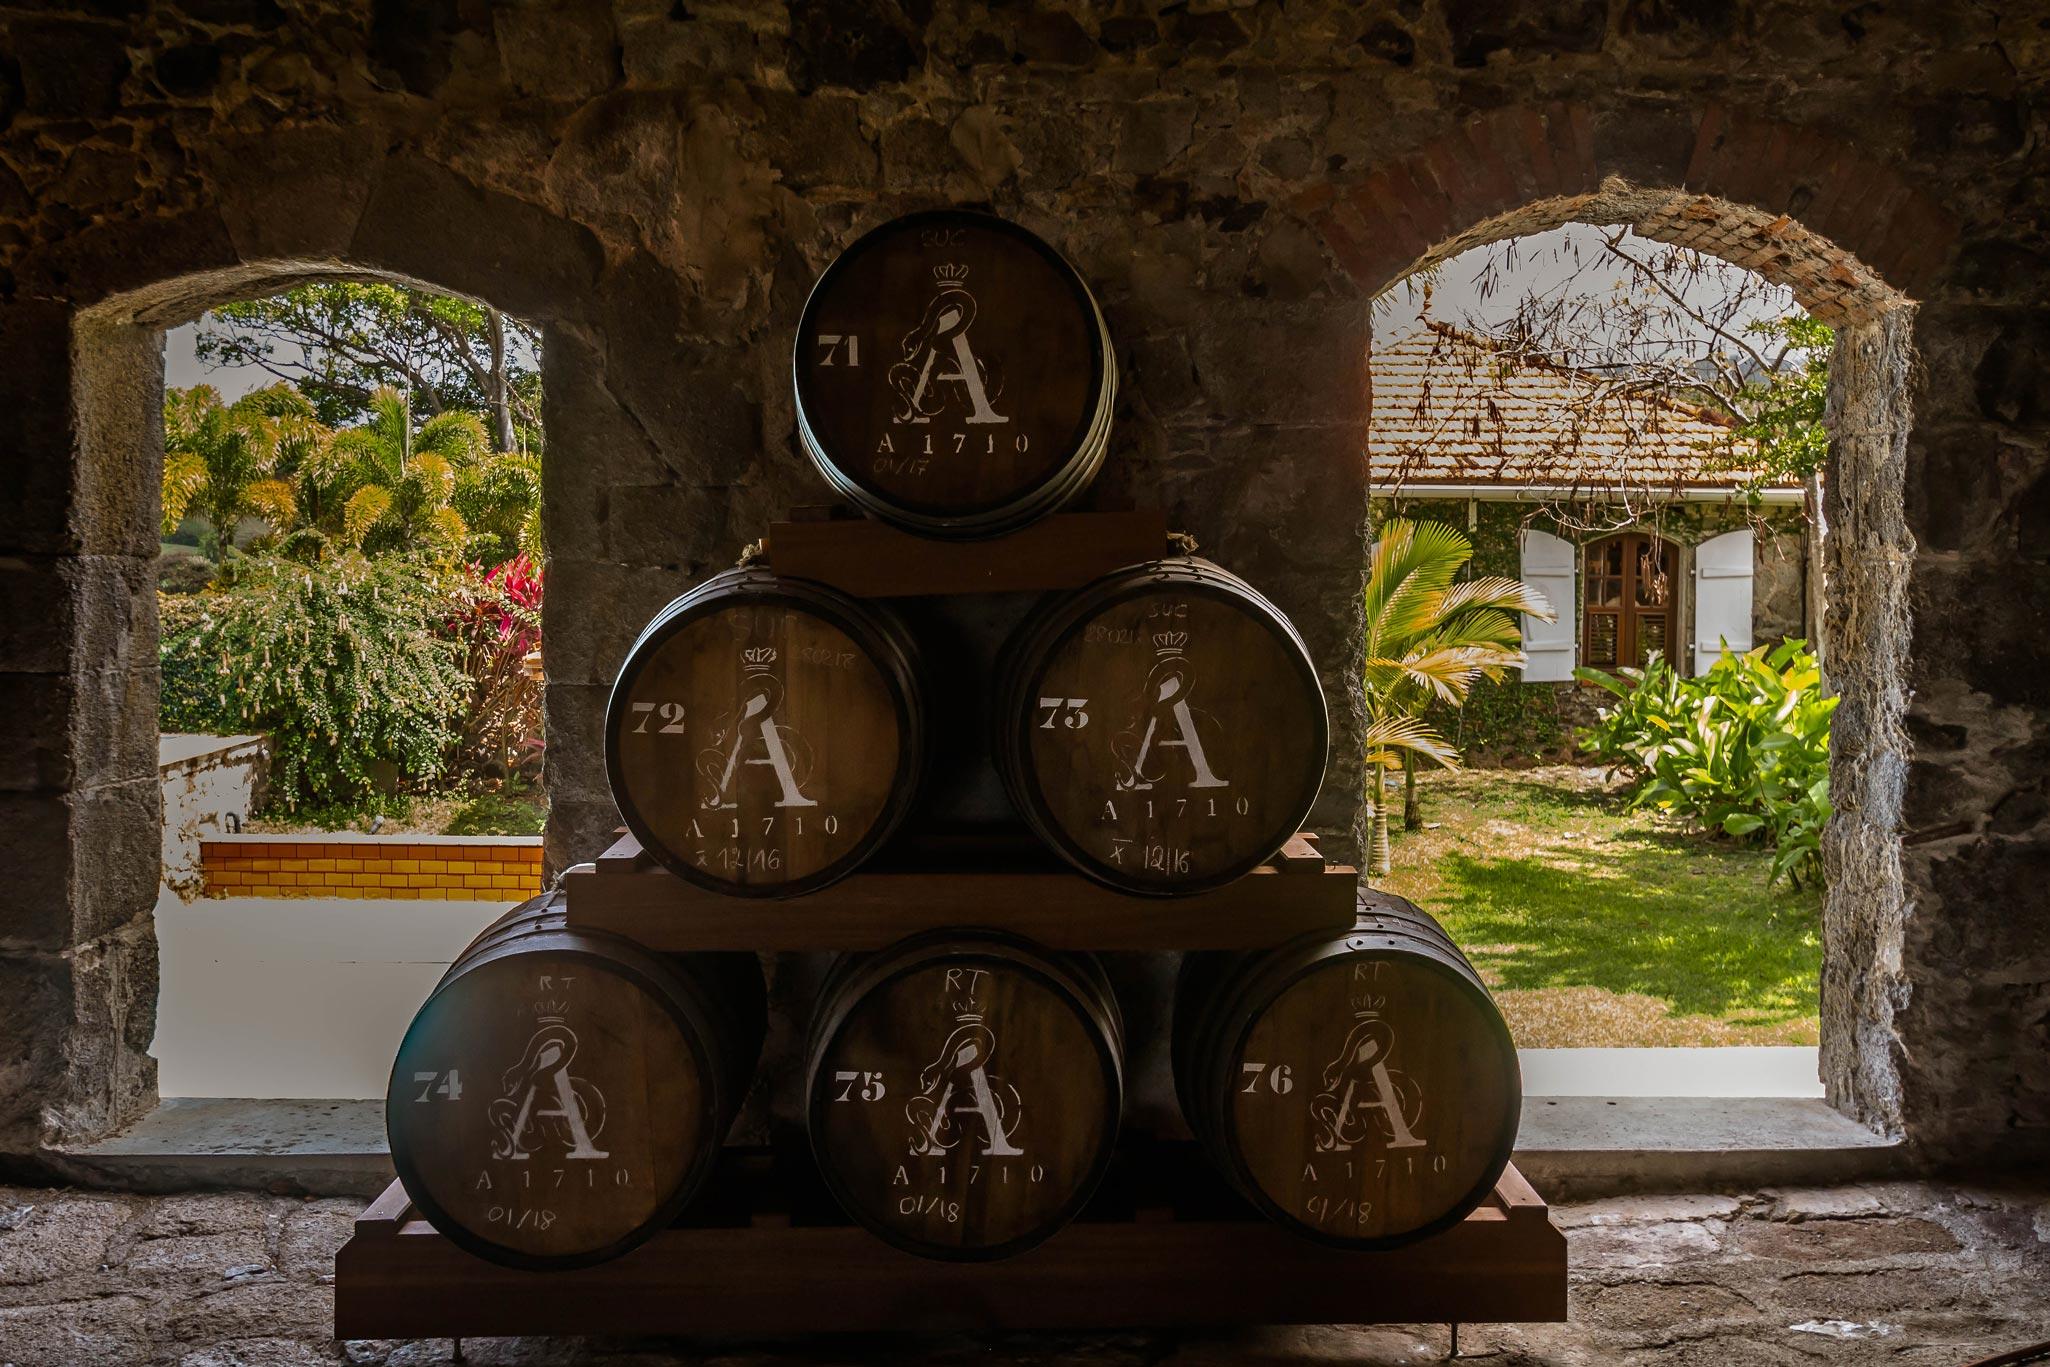 martinique, habitation du simon : chai futs de rhum